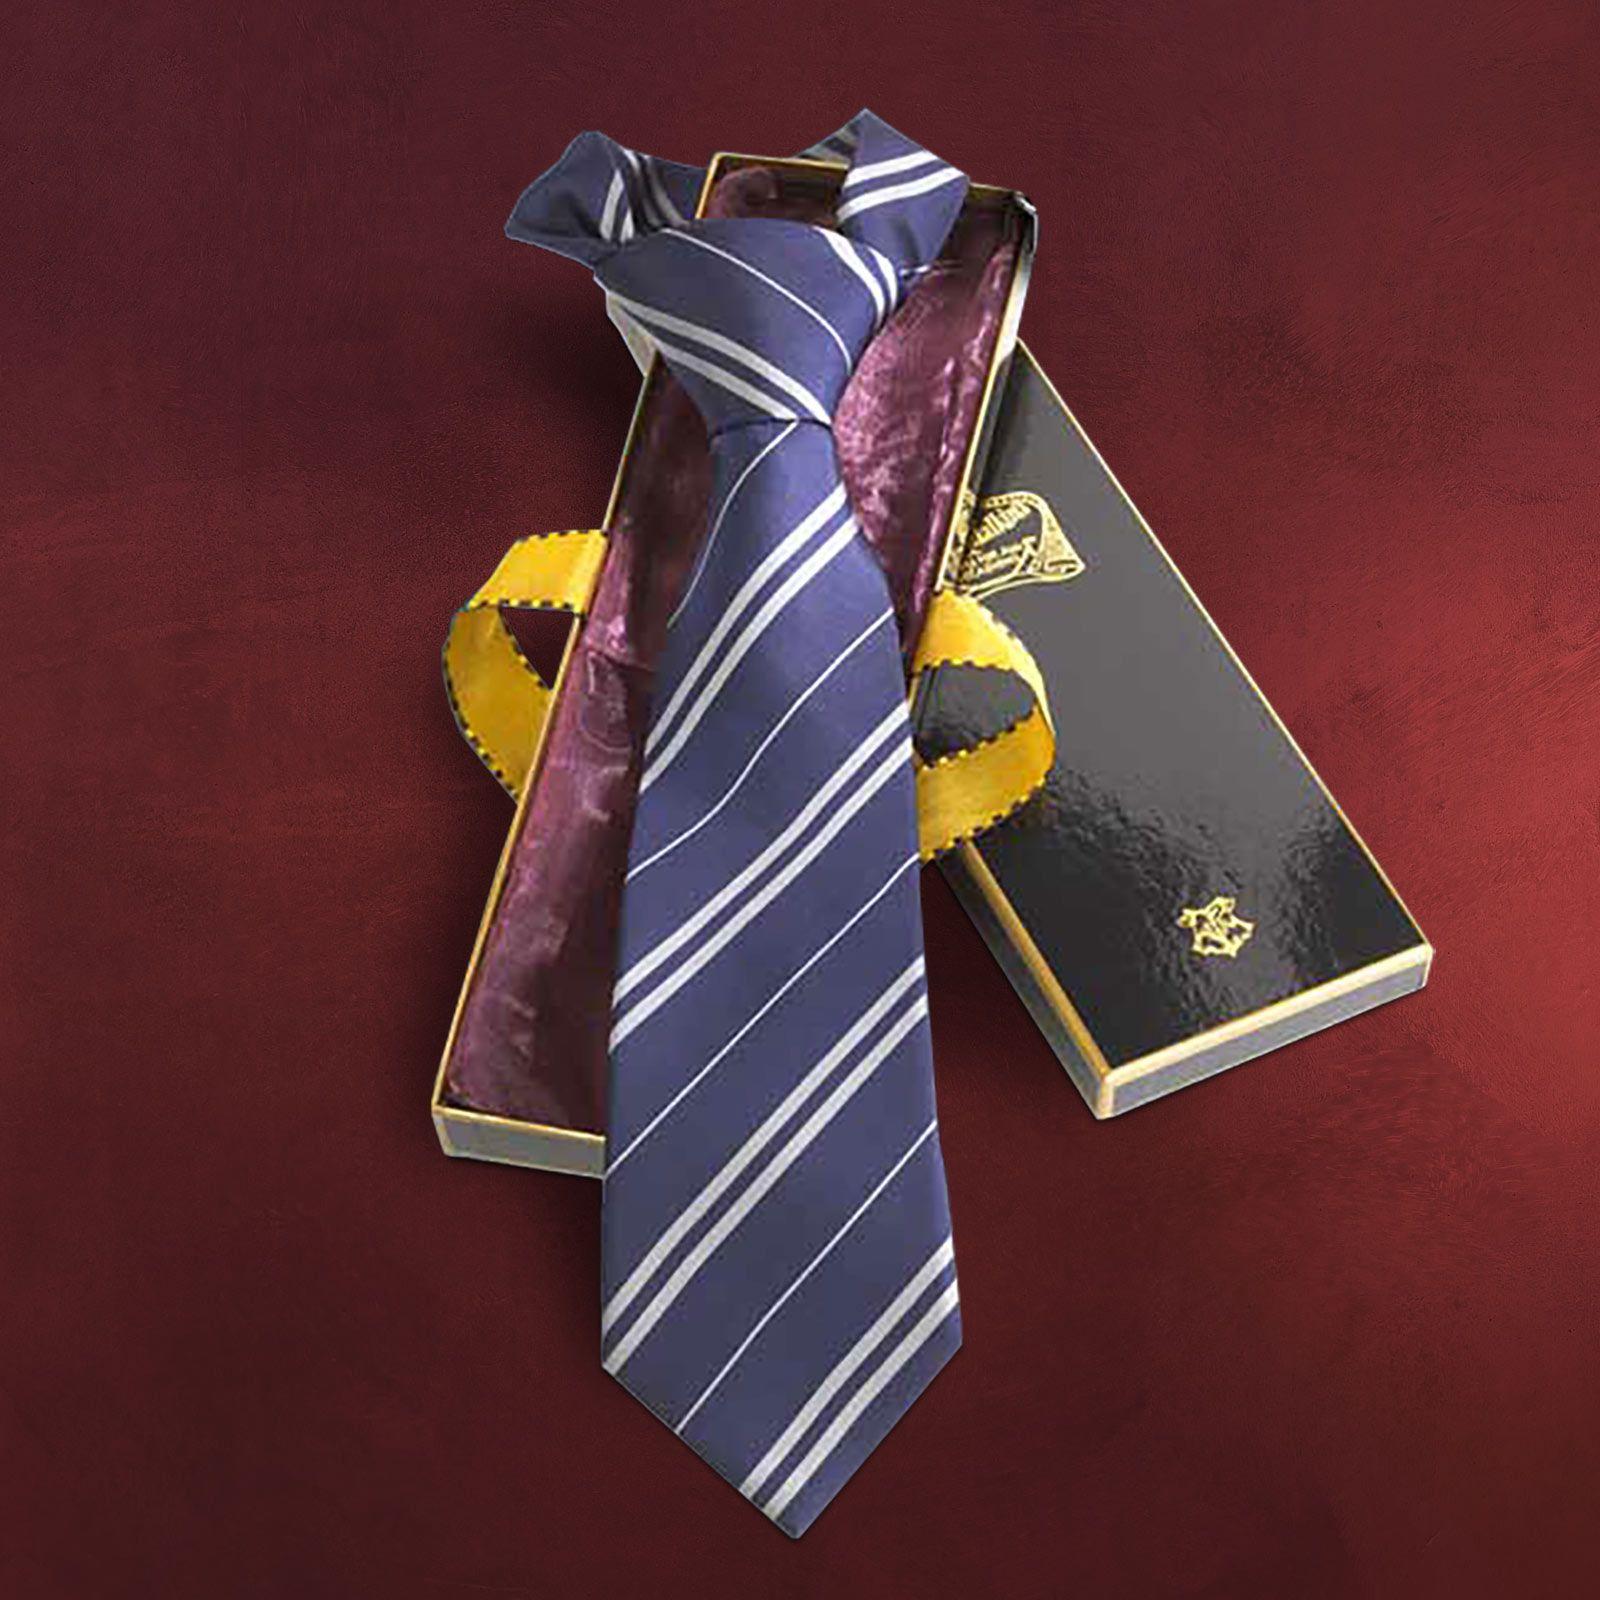 Ravenclaw Kravatte Ravenclaw Krawatte Harry Potter Elbenwald